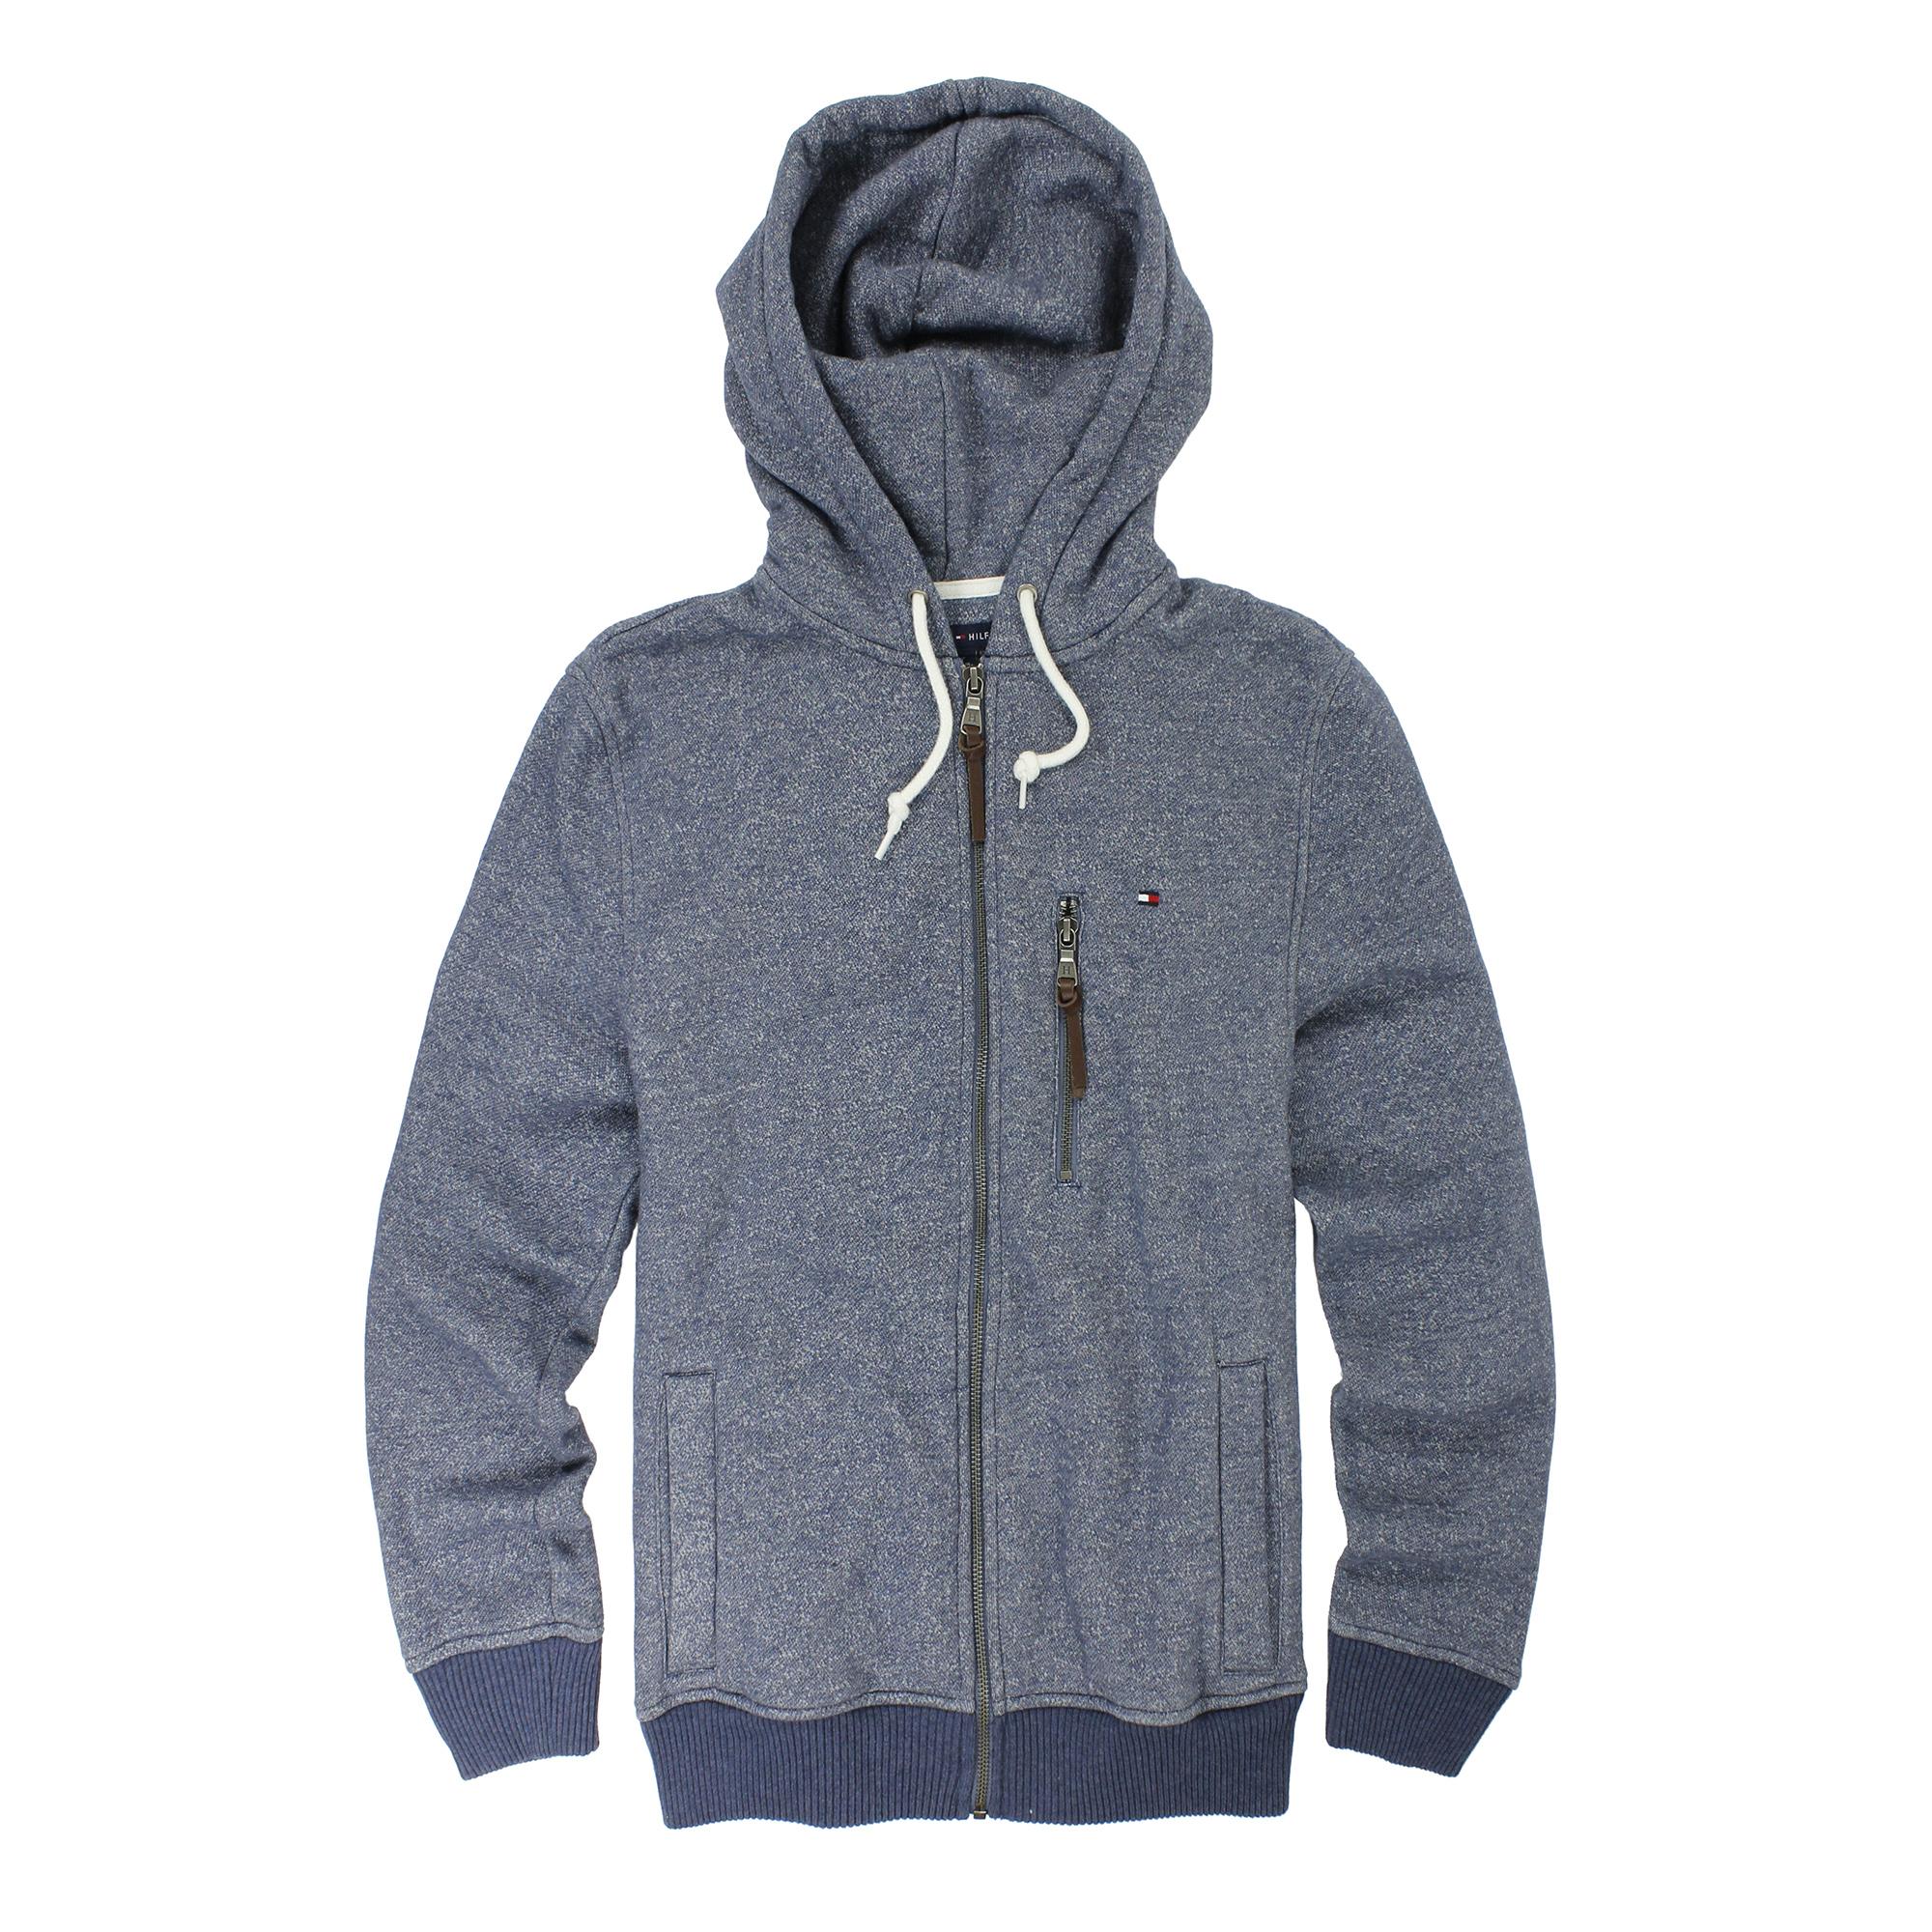 美國百分百【全新真品】Tommy Hilfiger 外套 TH 男 藏藍色 夾克 連帽 帽T 經典 S M L E354